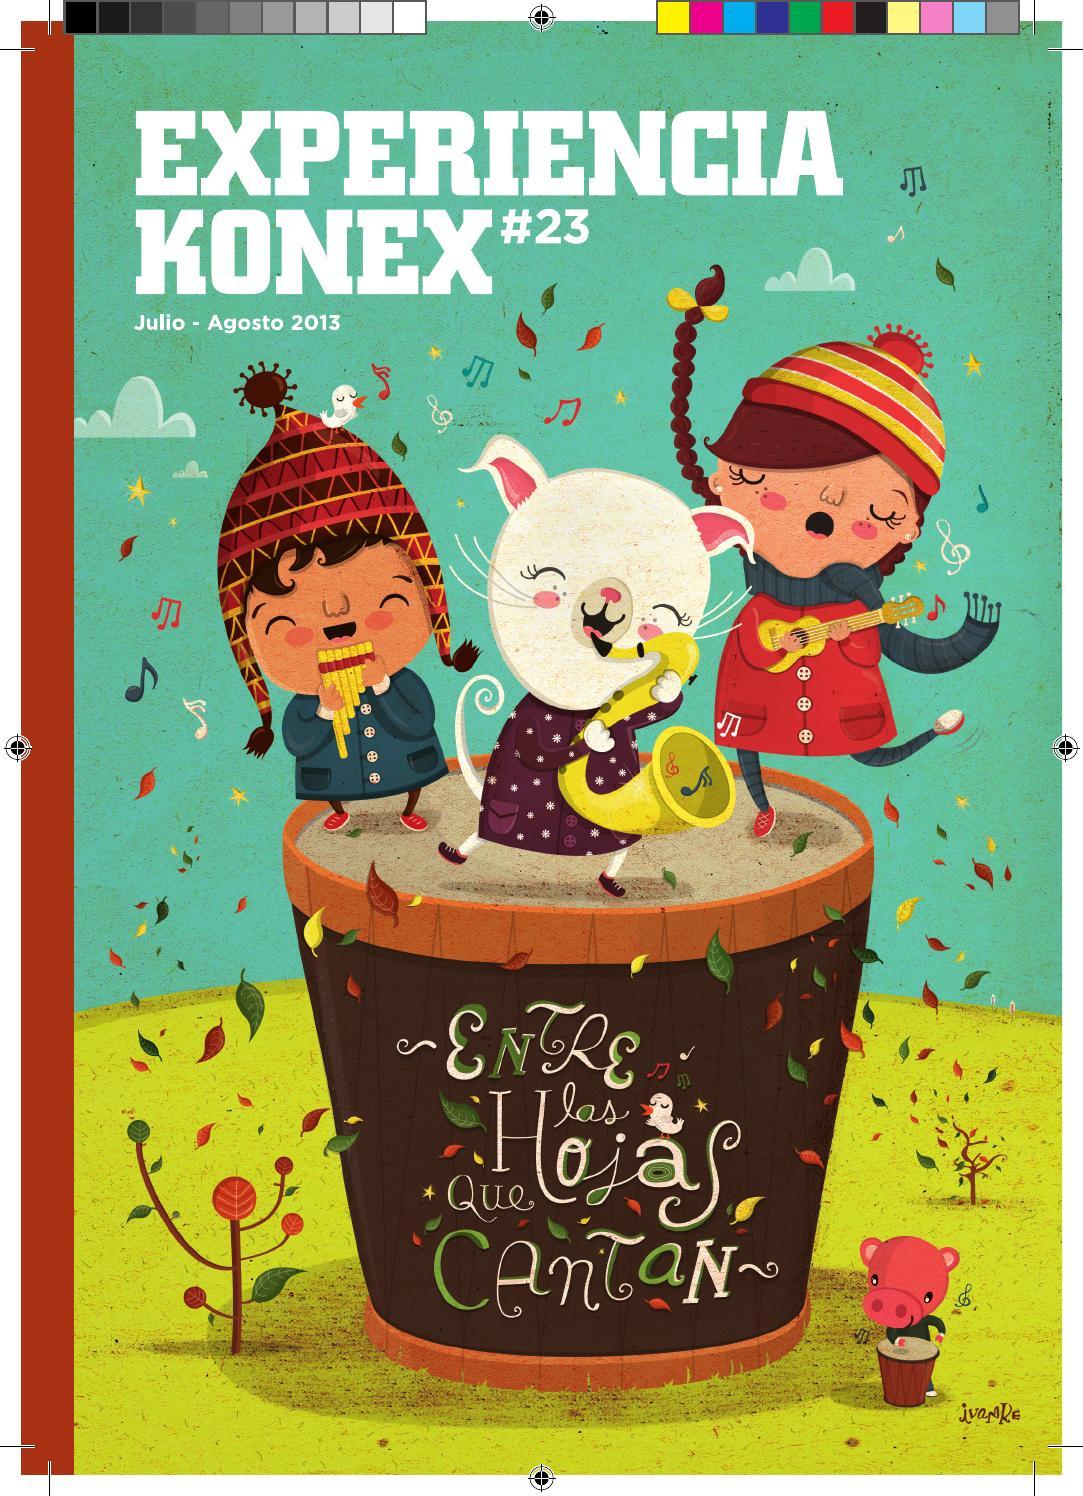 a6ddee8232 Revista Experiencia Konex  23 by Ciudad Cultural Konex - issuu